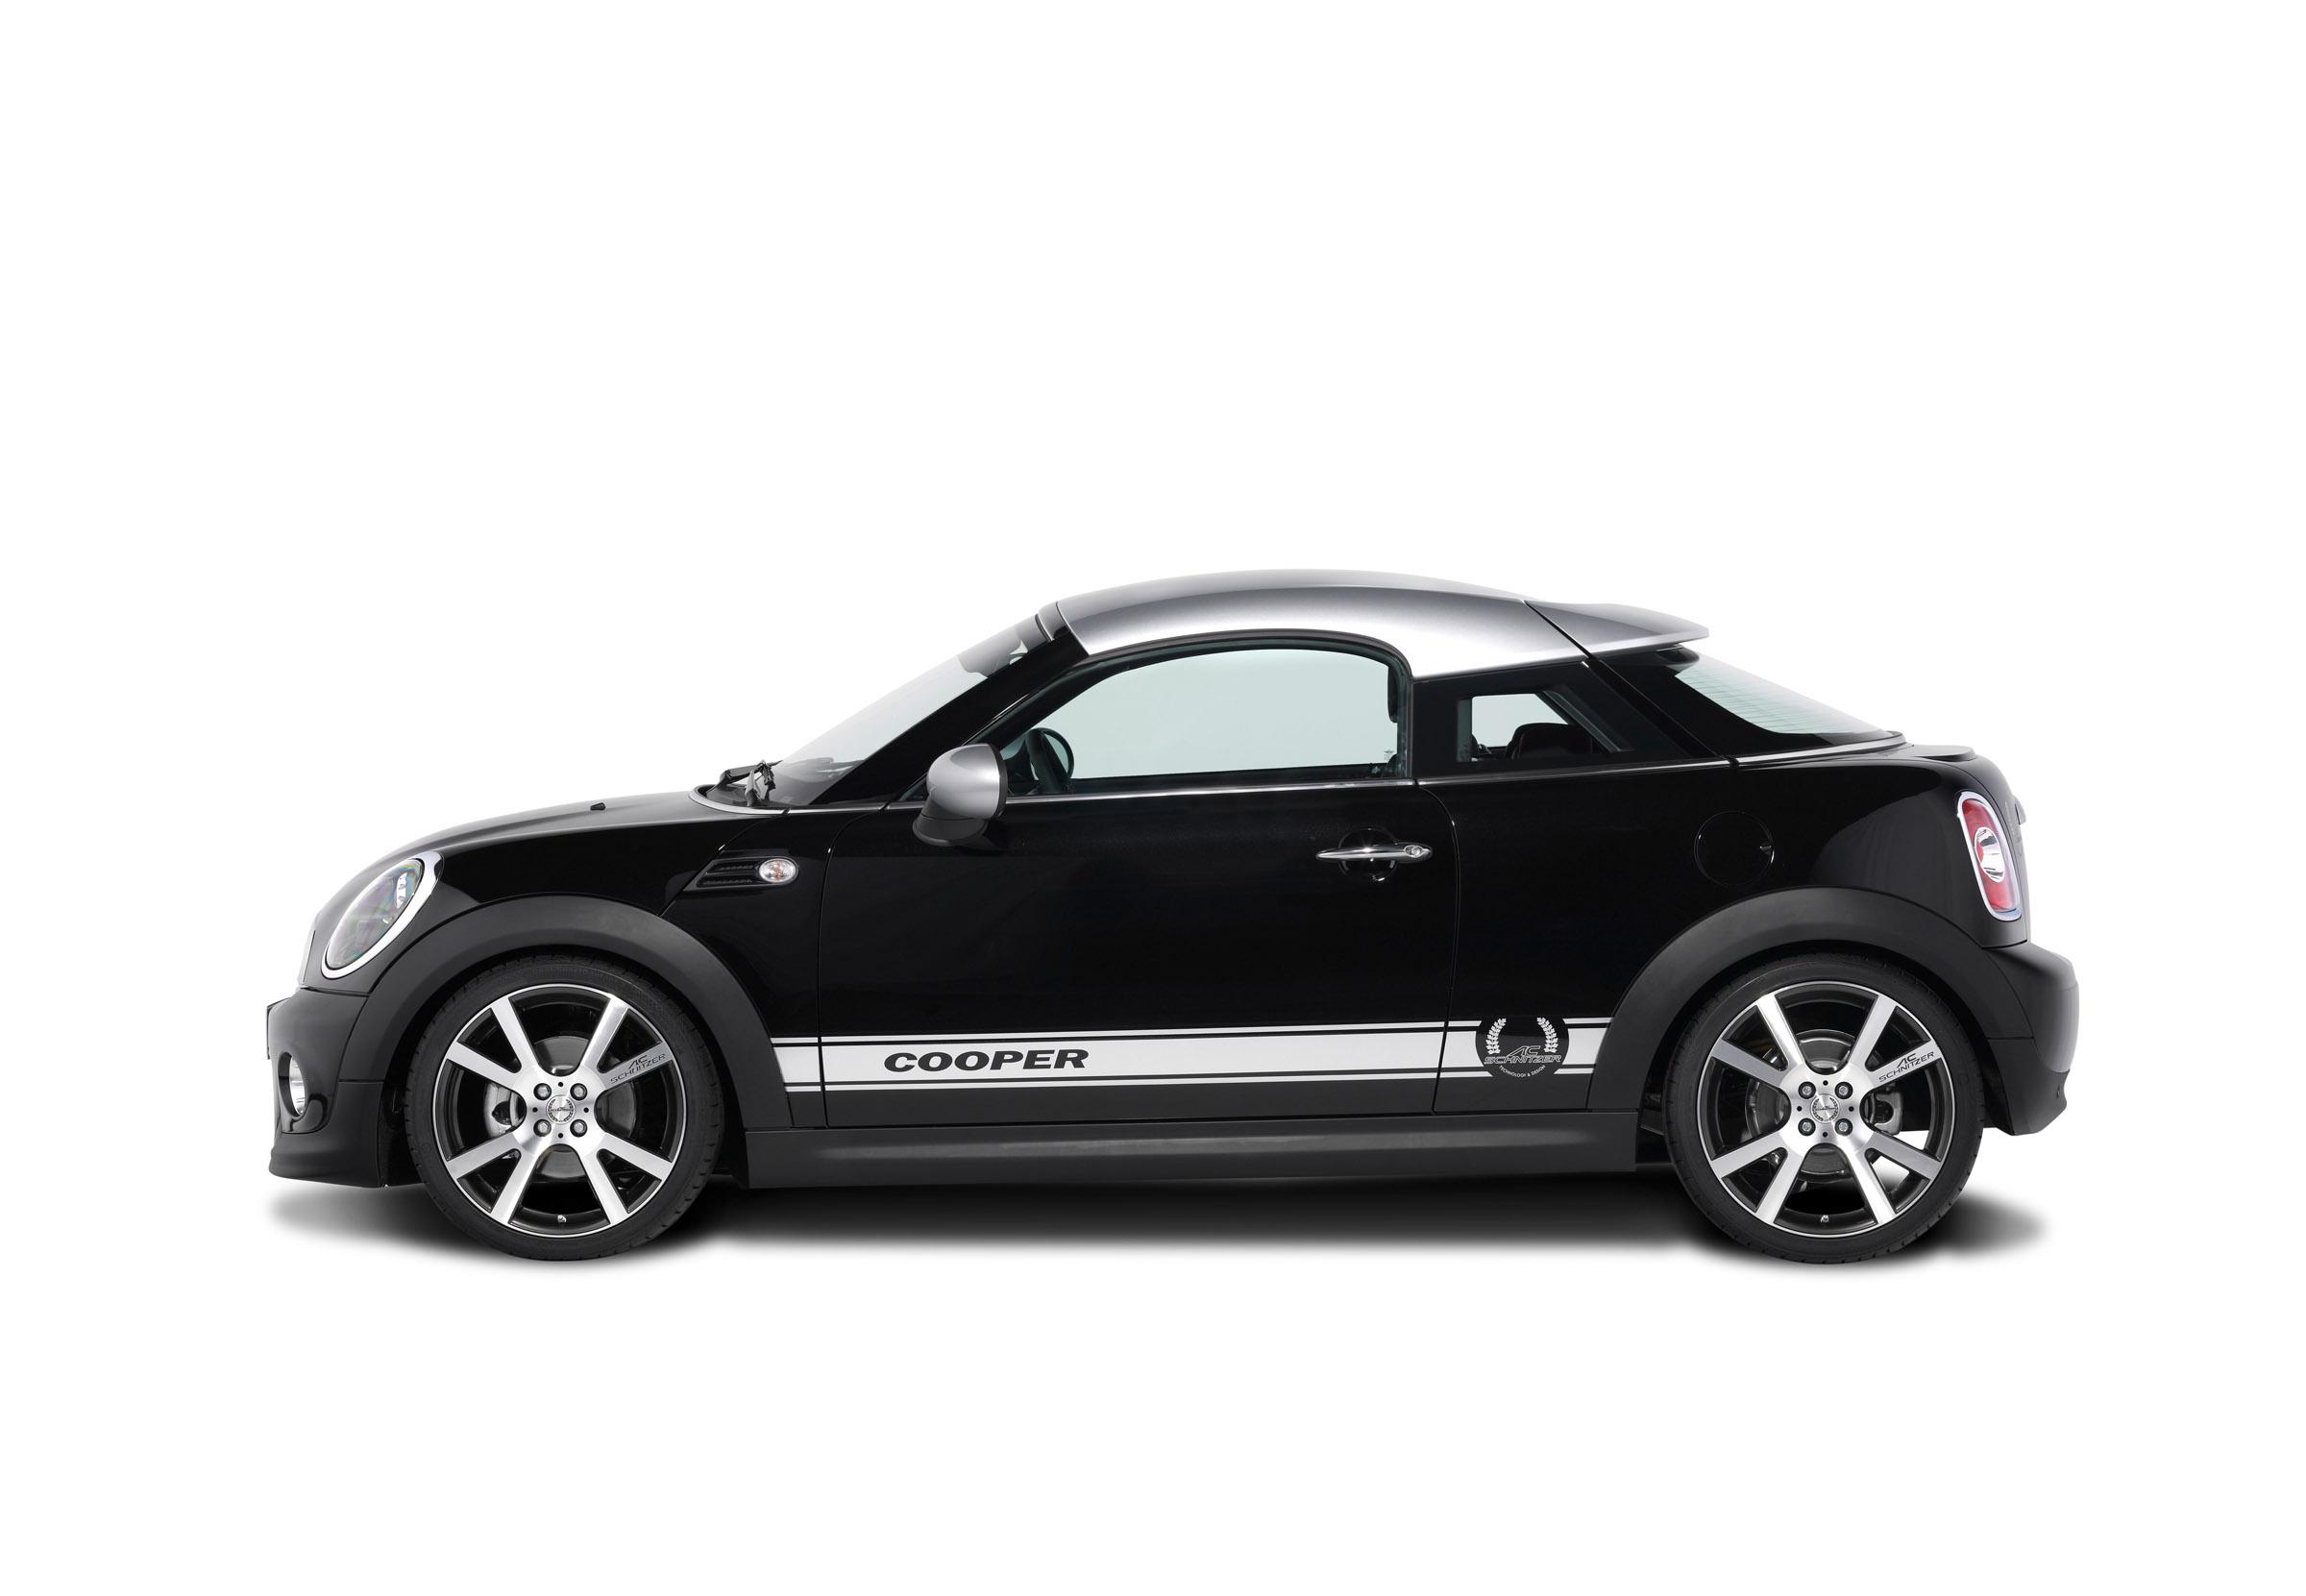 2012 AC Schnitzer MINI Cooper Coupé  - фотография №3